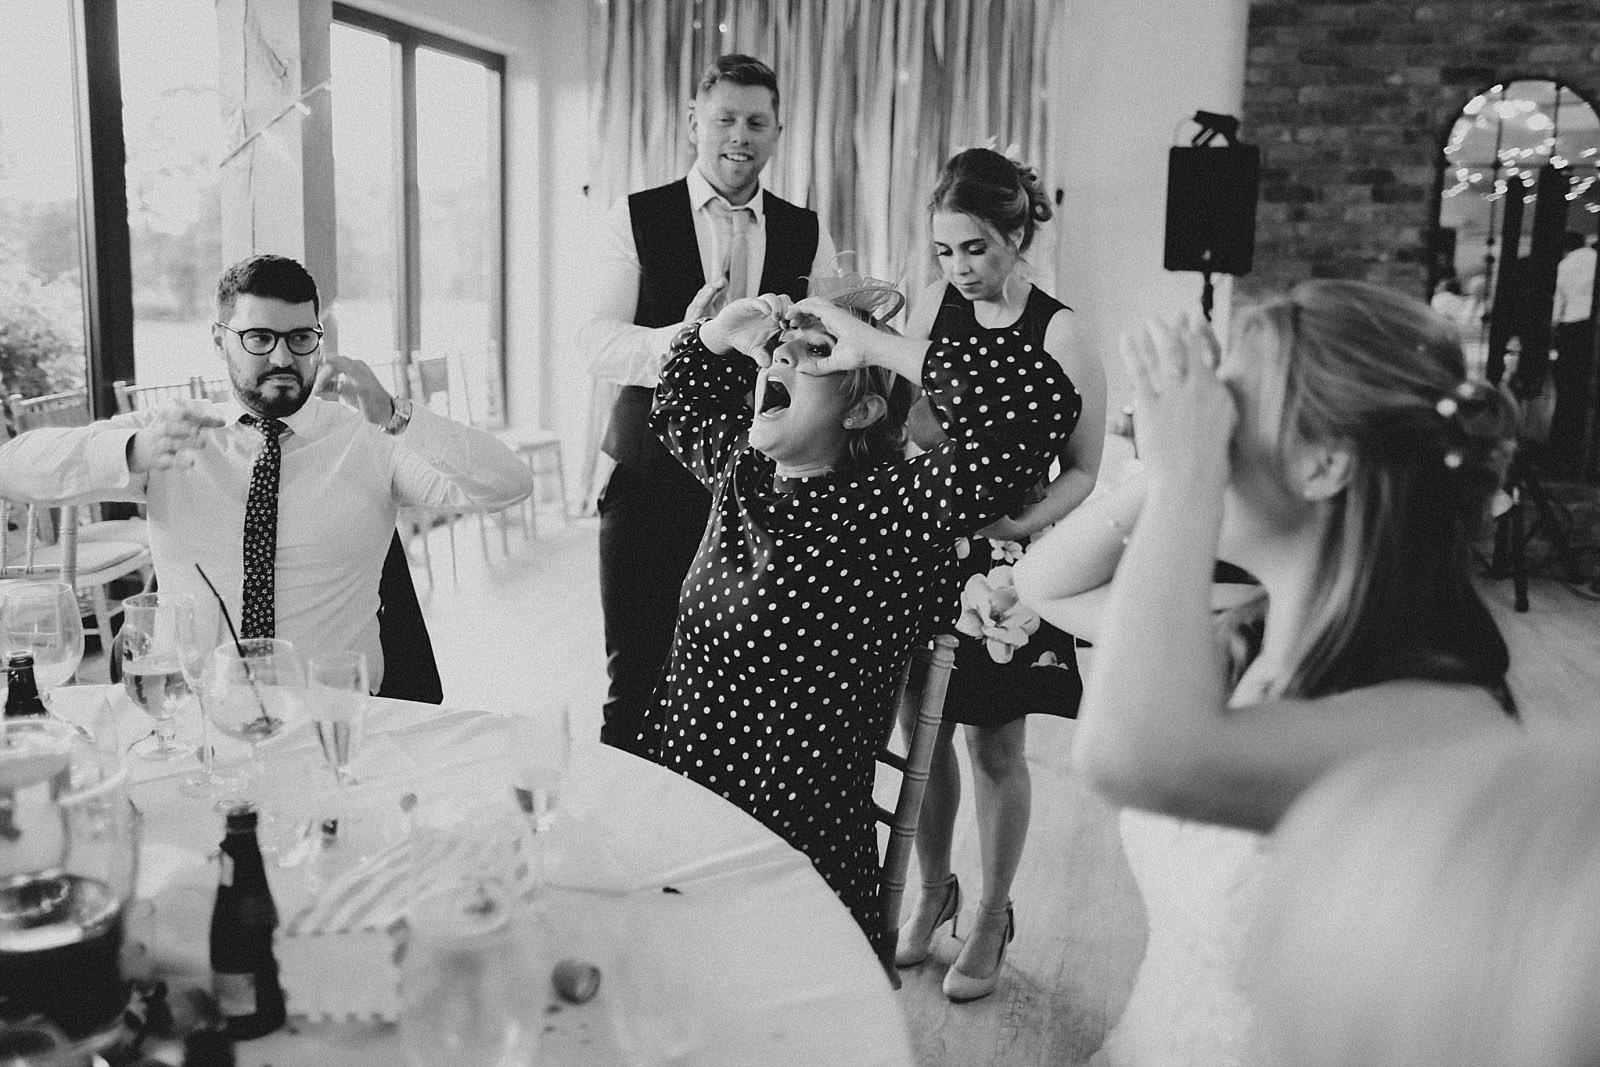 woman playing buck eye at a wedding